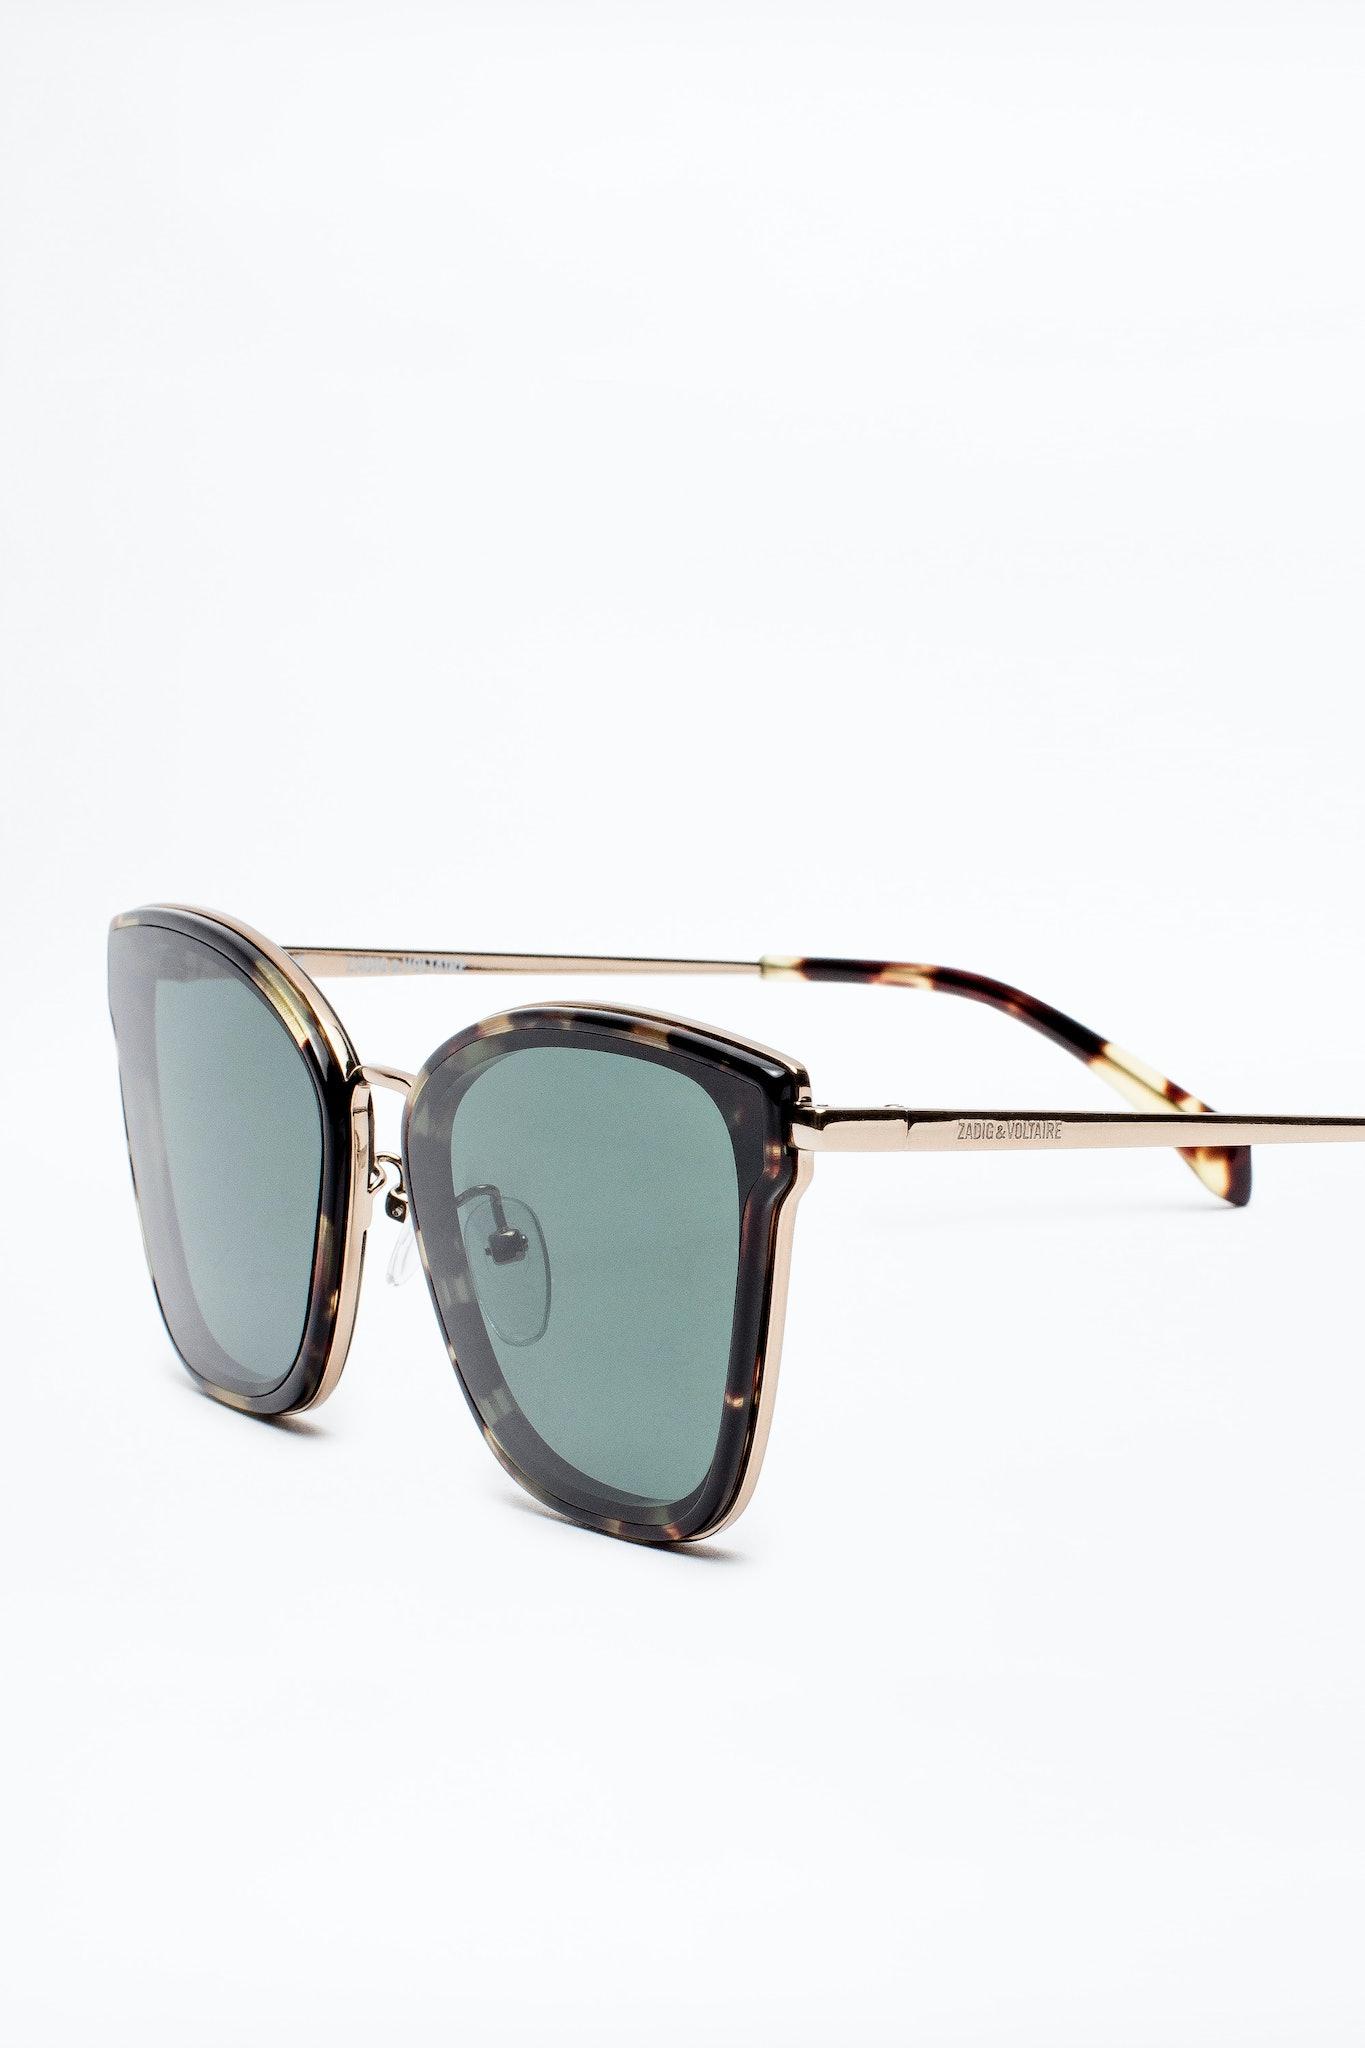 SZV195 Sunglasses